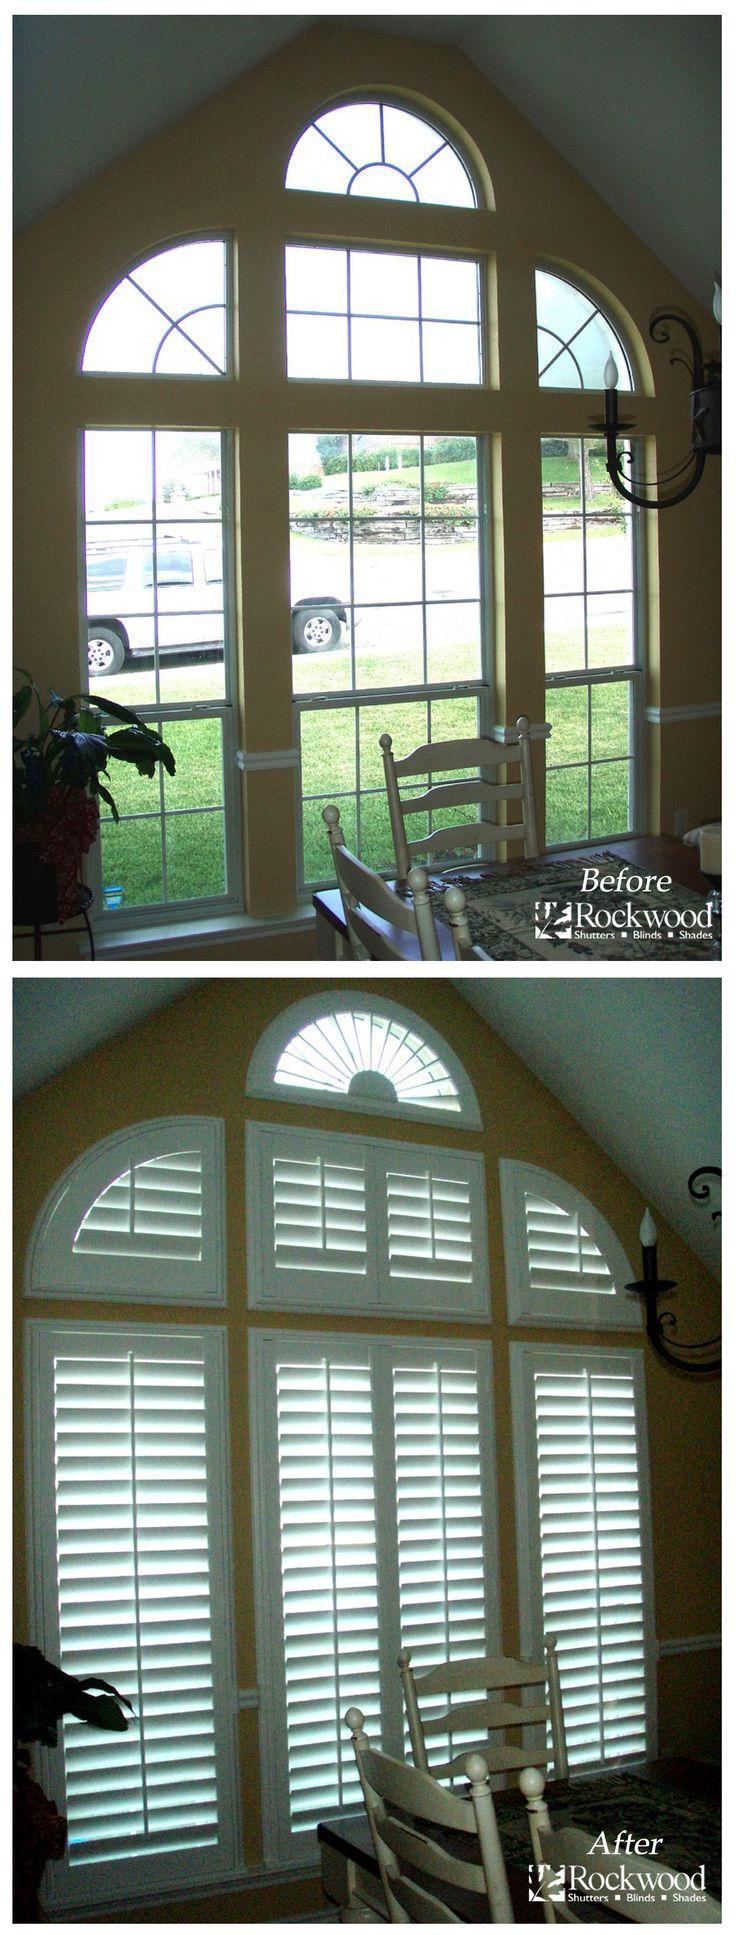 17 best images about shutters on pinterest plantation for Shutter window treatment ideas